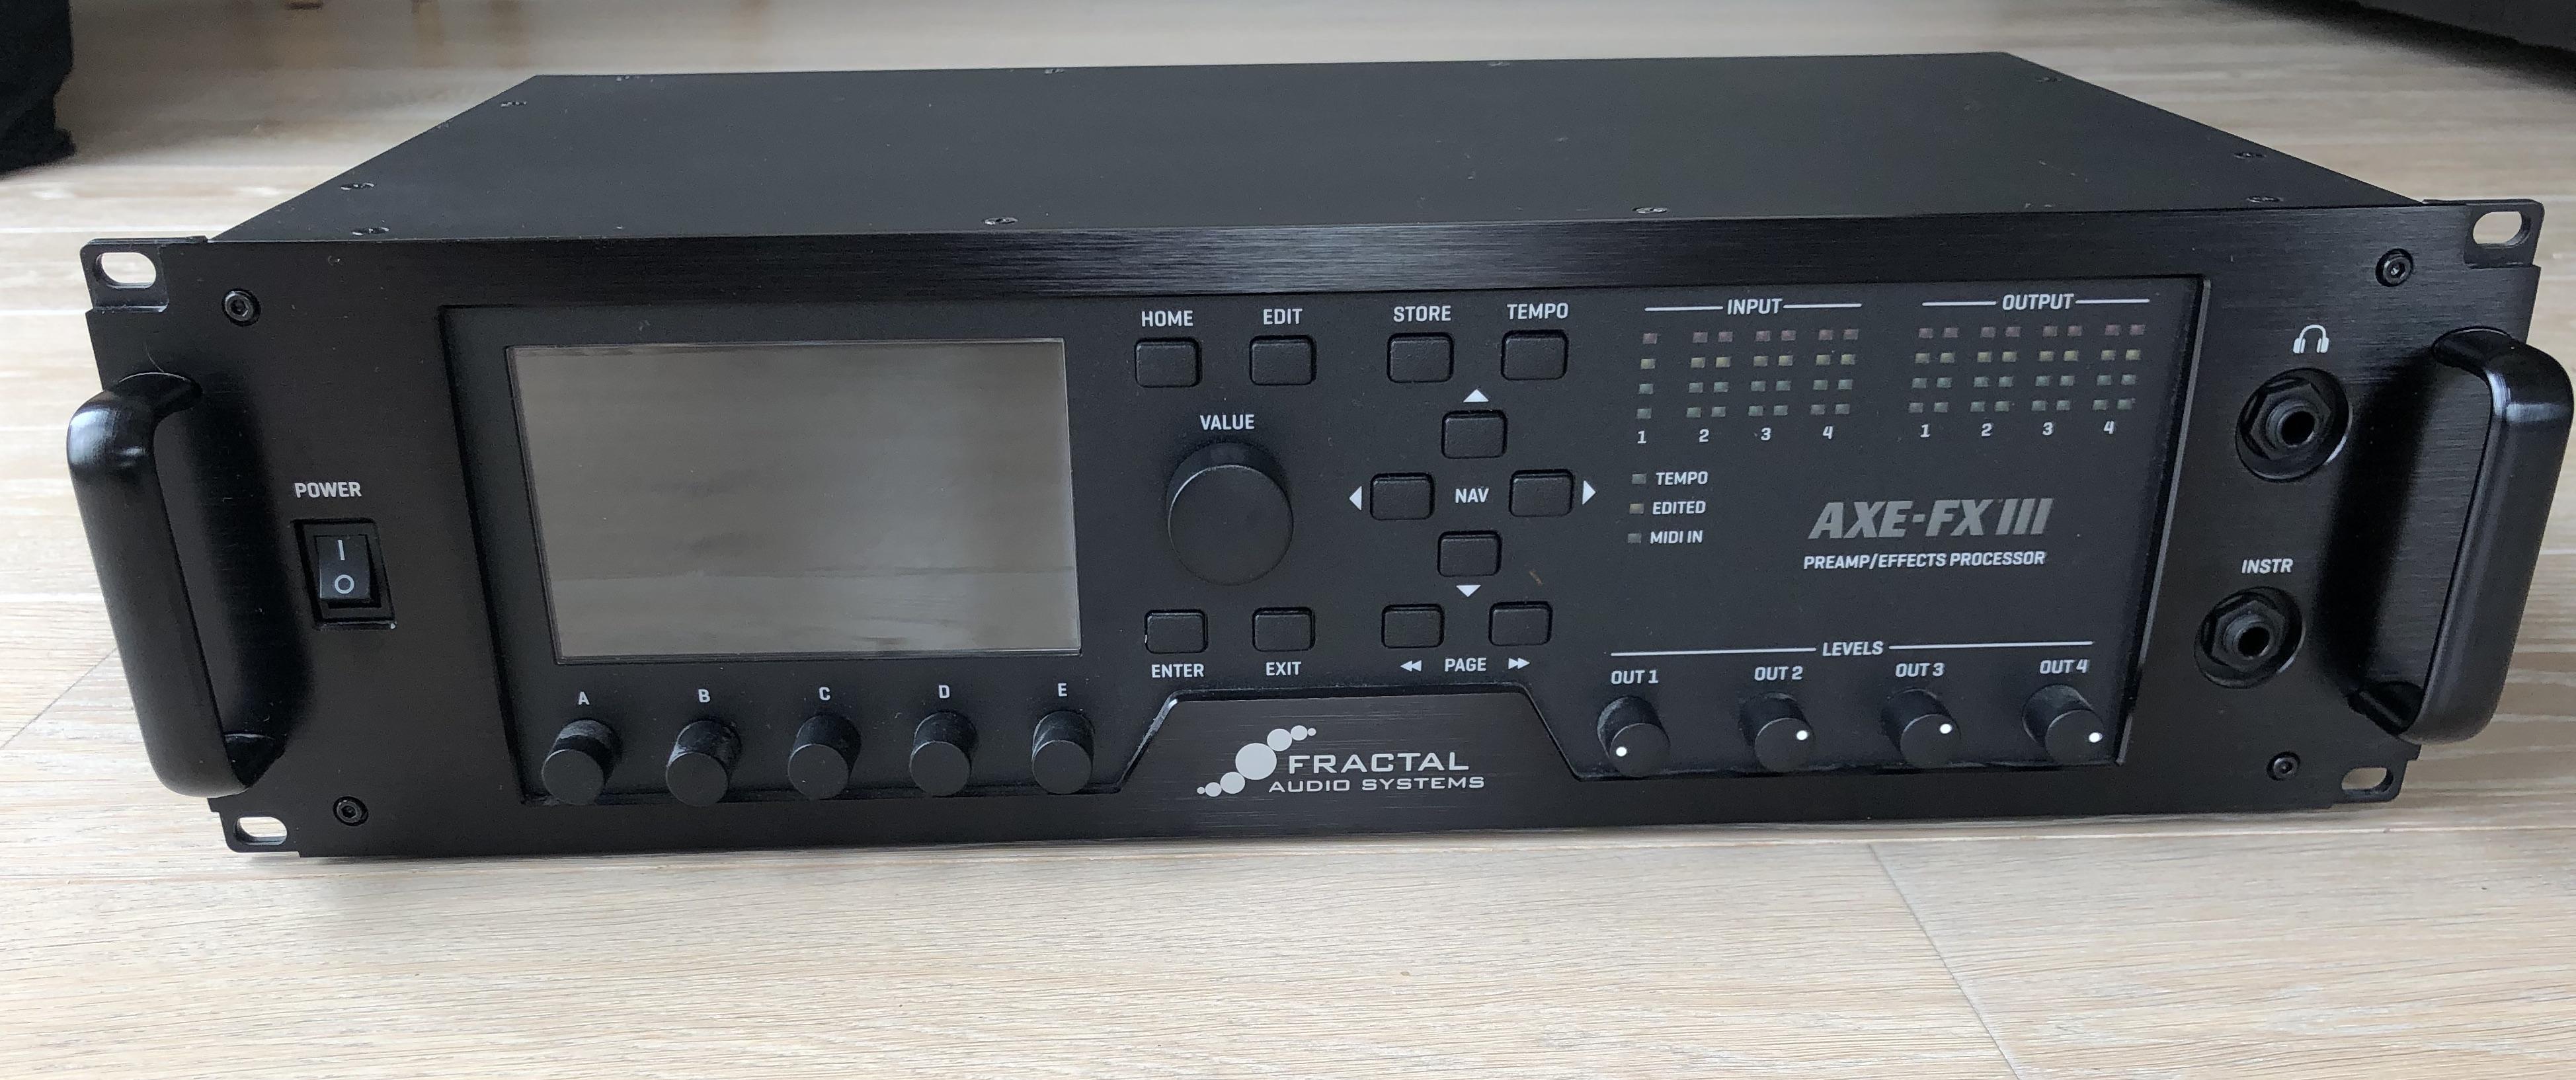 AXE-FX III - Fractal Audio Systems Axe-Fx III - Audiofanzine